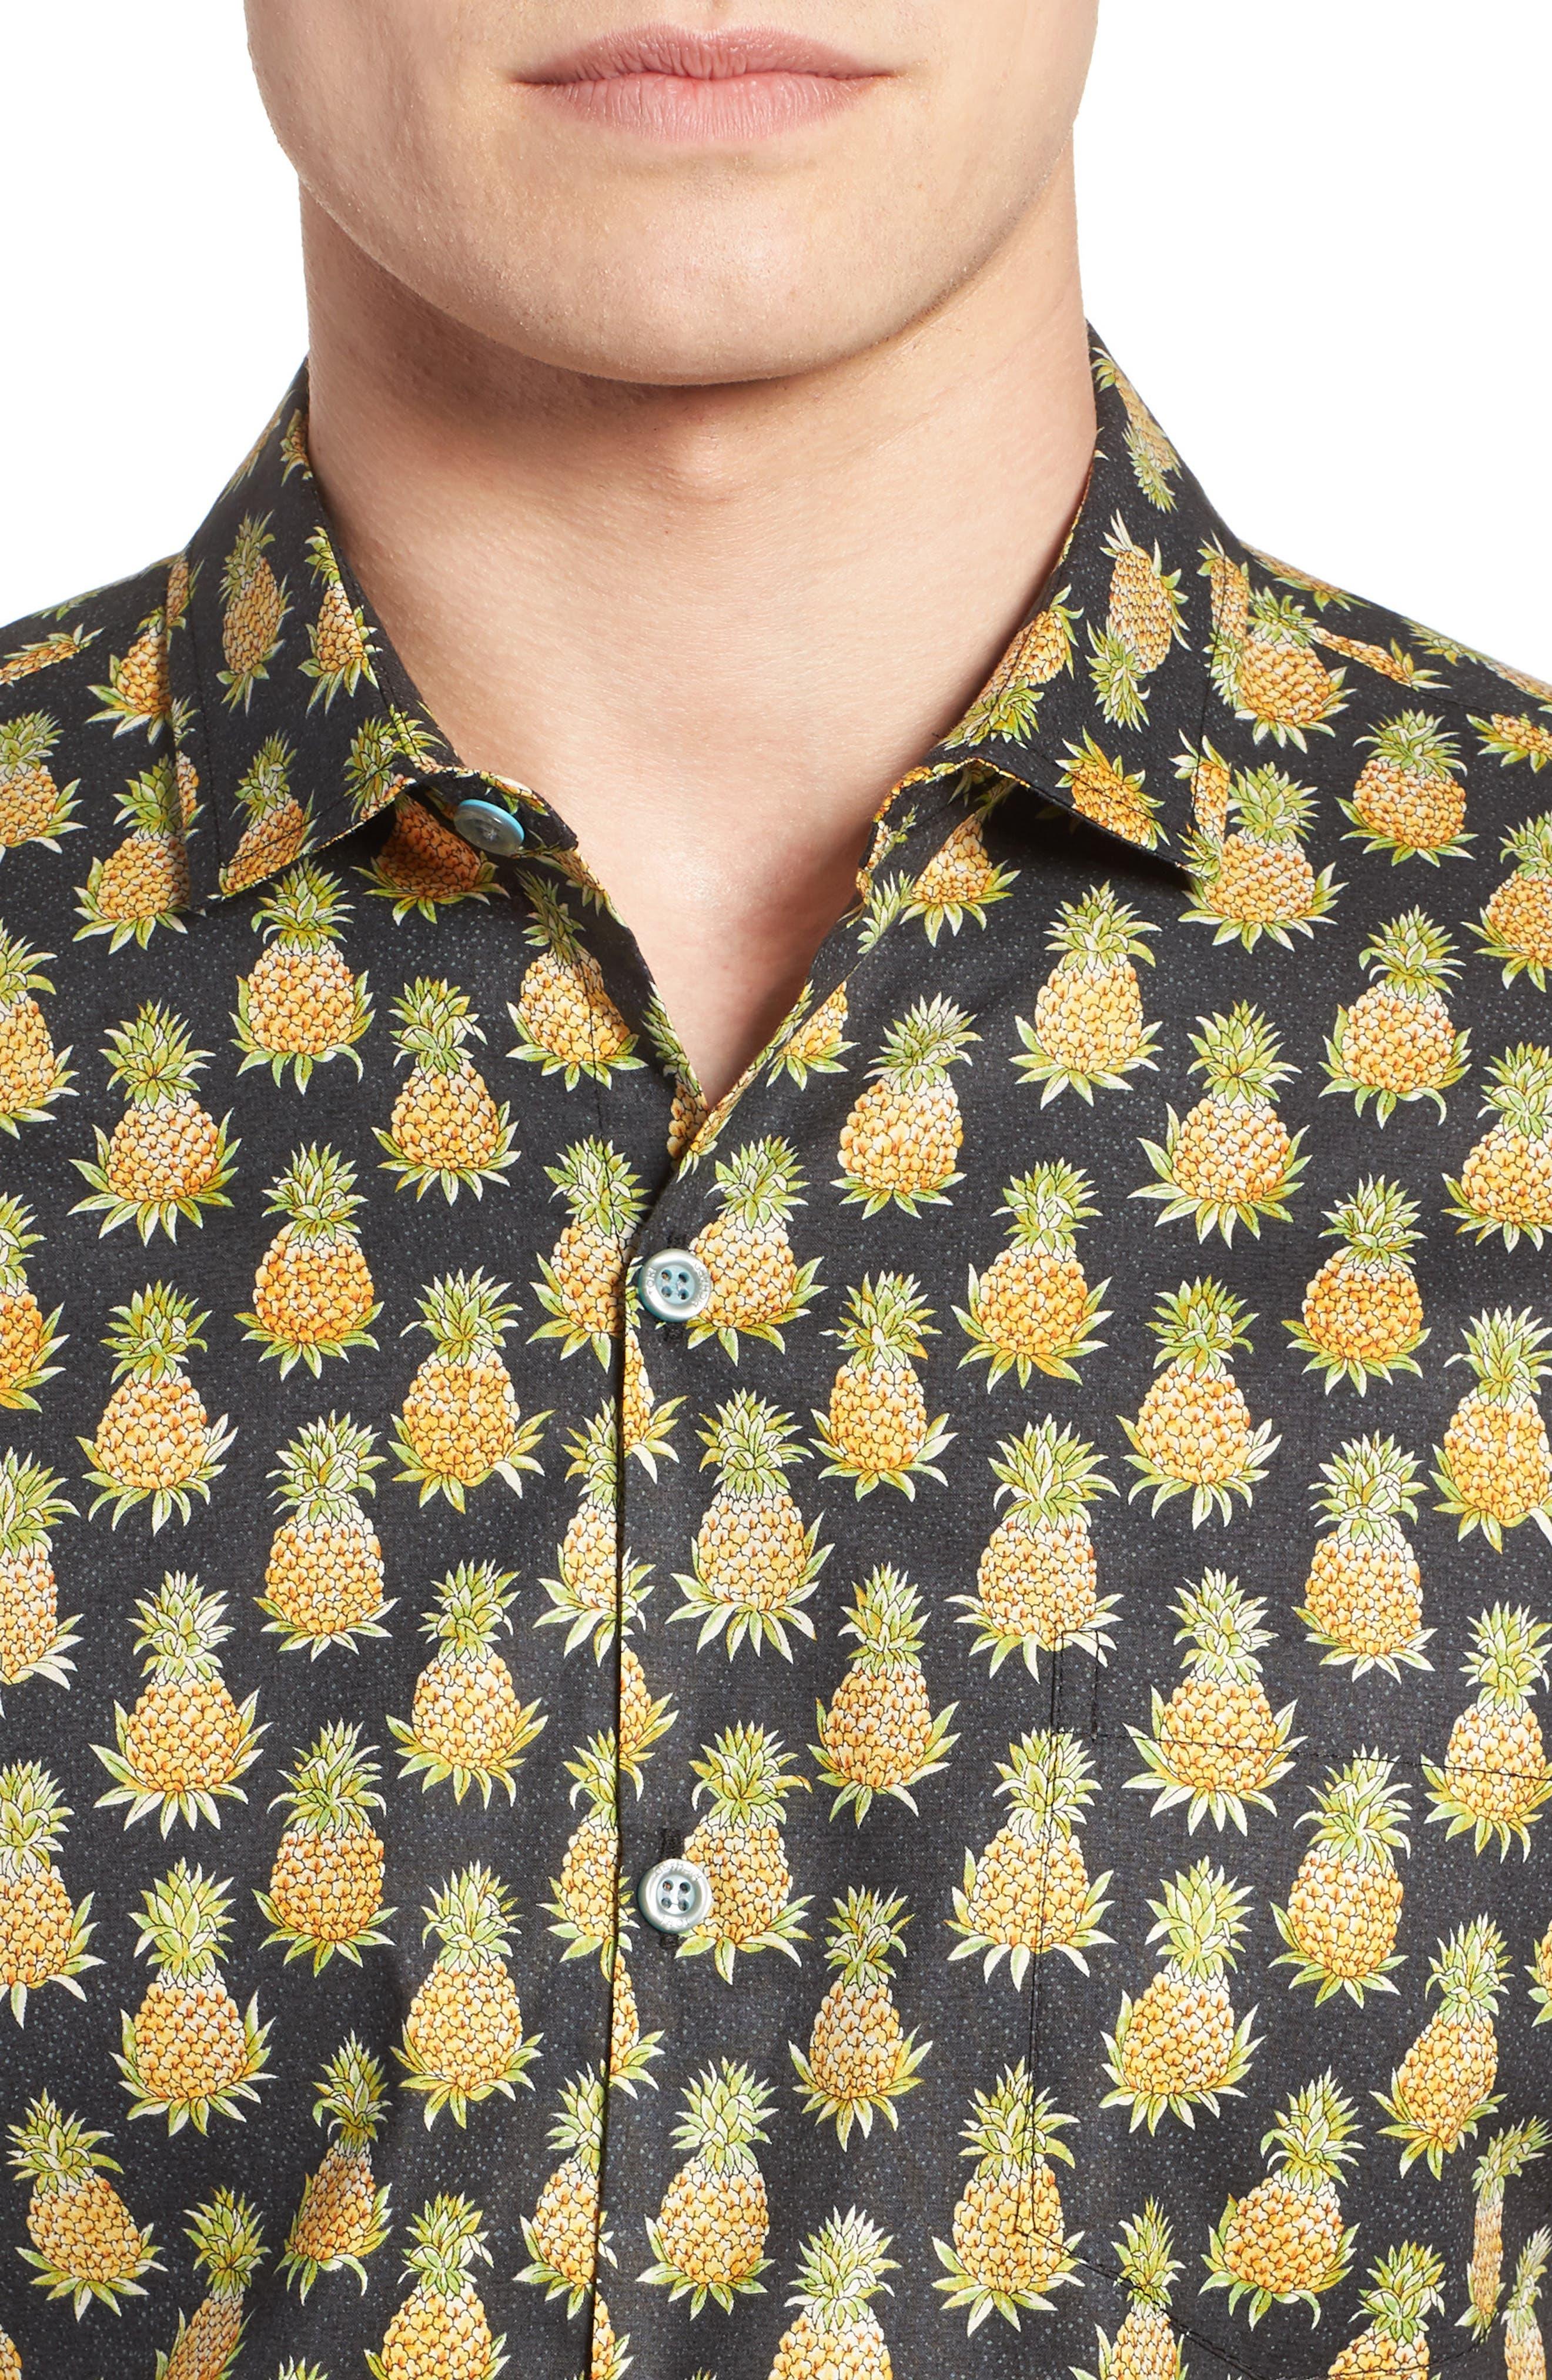 Pineaplism Trim Fit Camp Shirt,                             Alternate thumbnail 4, color,                             BLACK